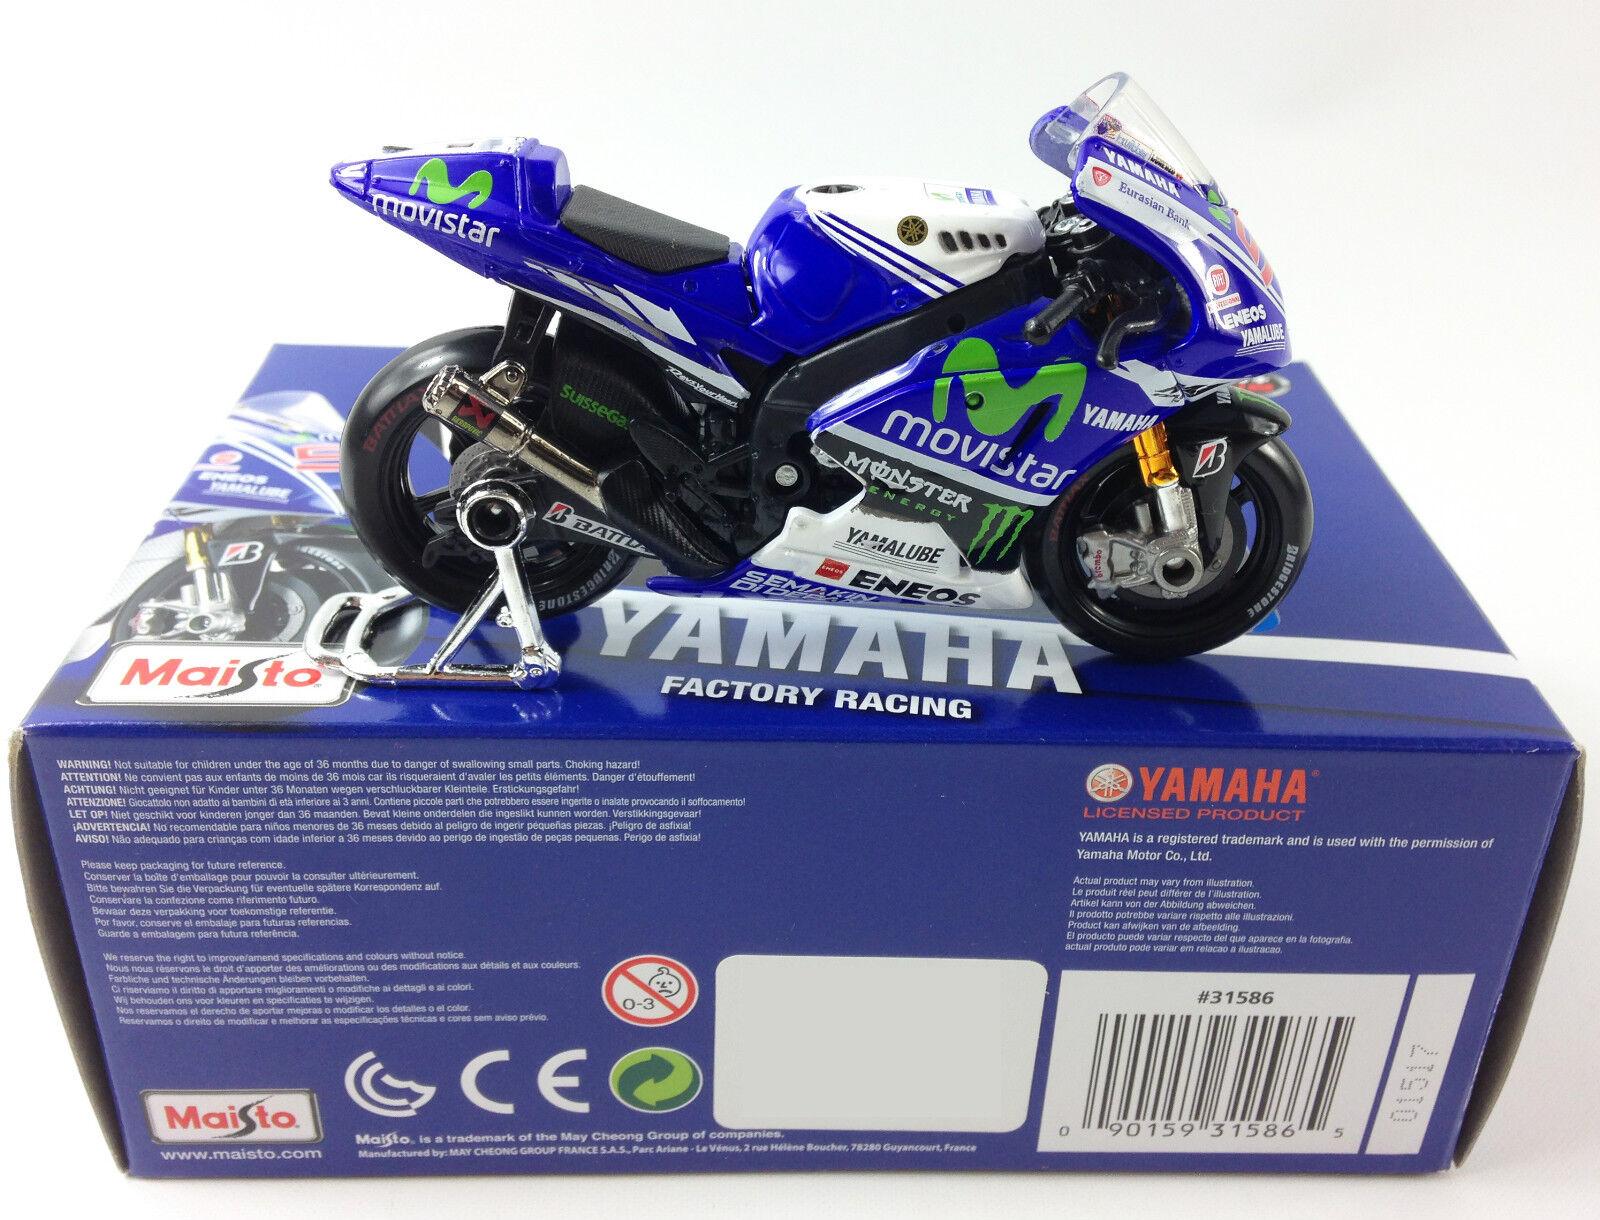 JORGE LORENZO USINE YAMAHA YZR-M1 moto gp moulé Jouet modèle modèle modèle vélo MAISTO 1:18 96bcc1